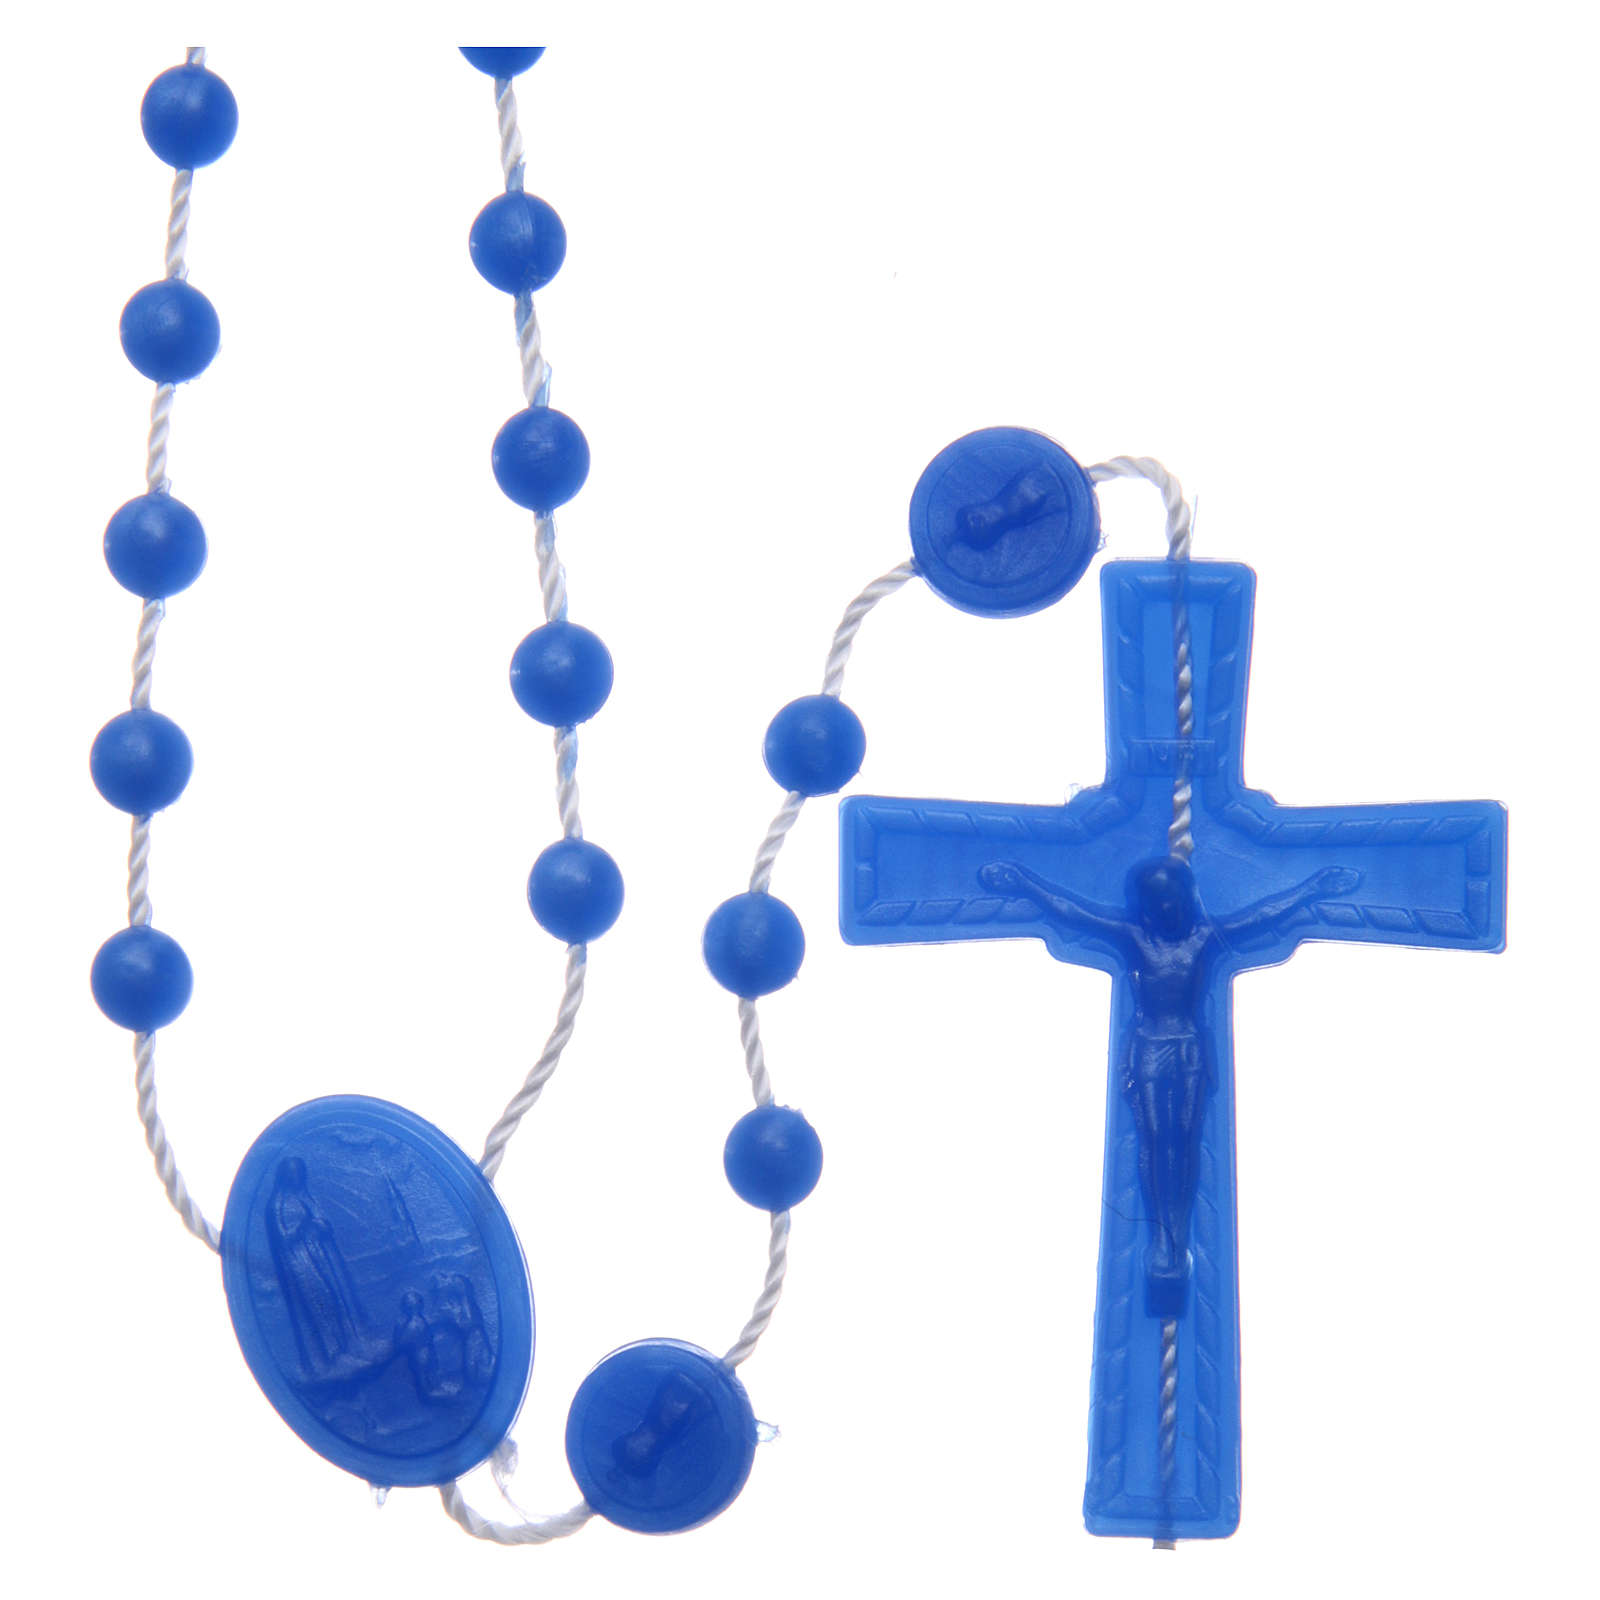 Terço Fátima náilon azul escuro 6 mm 4